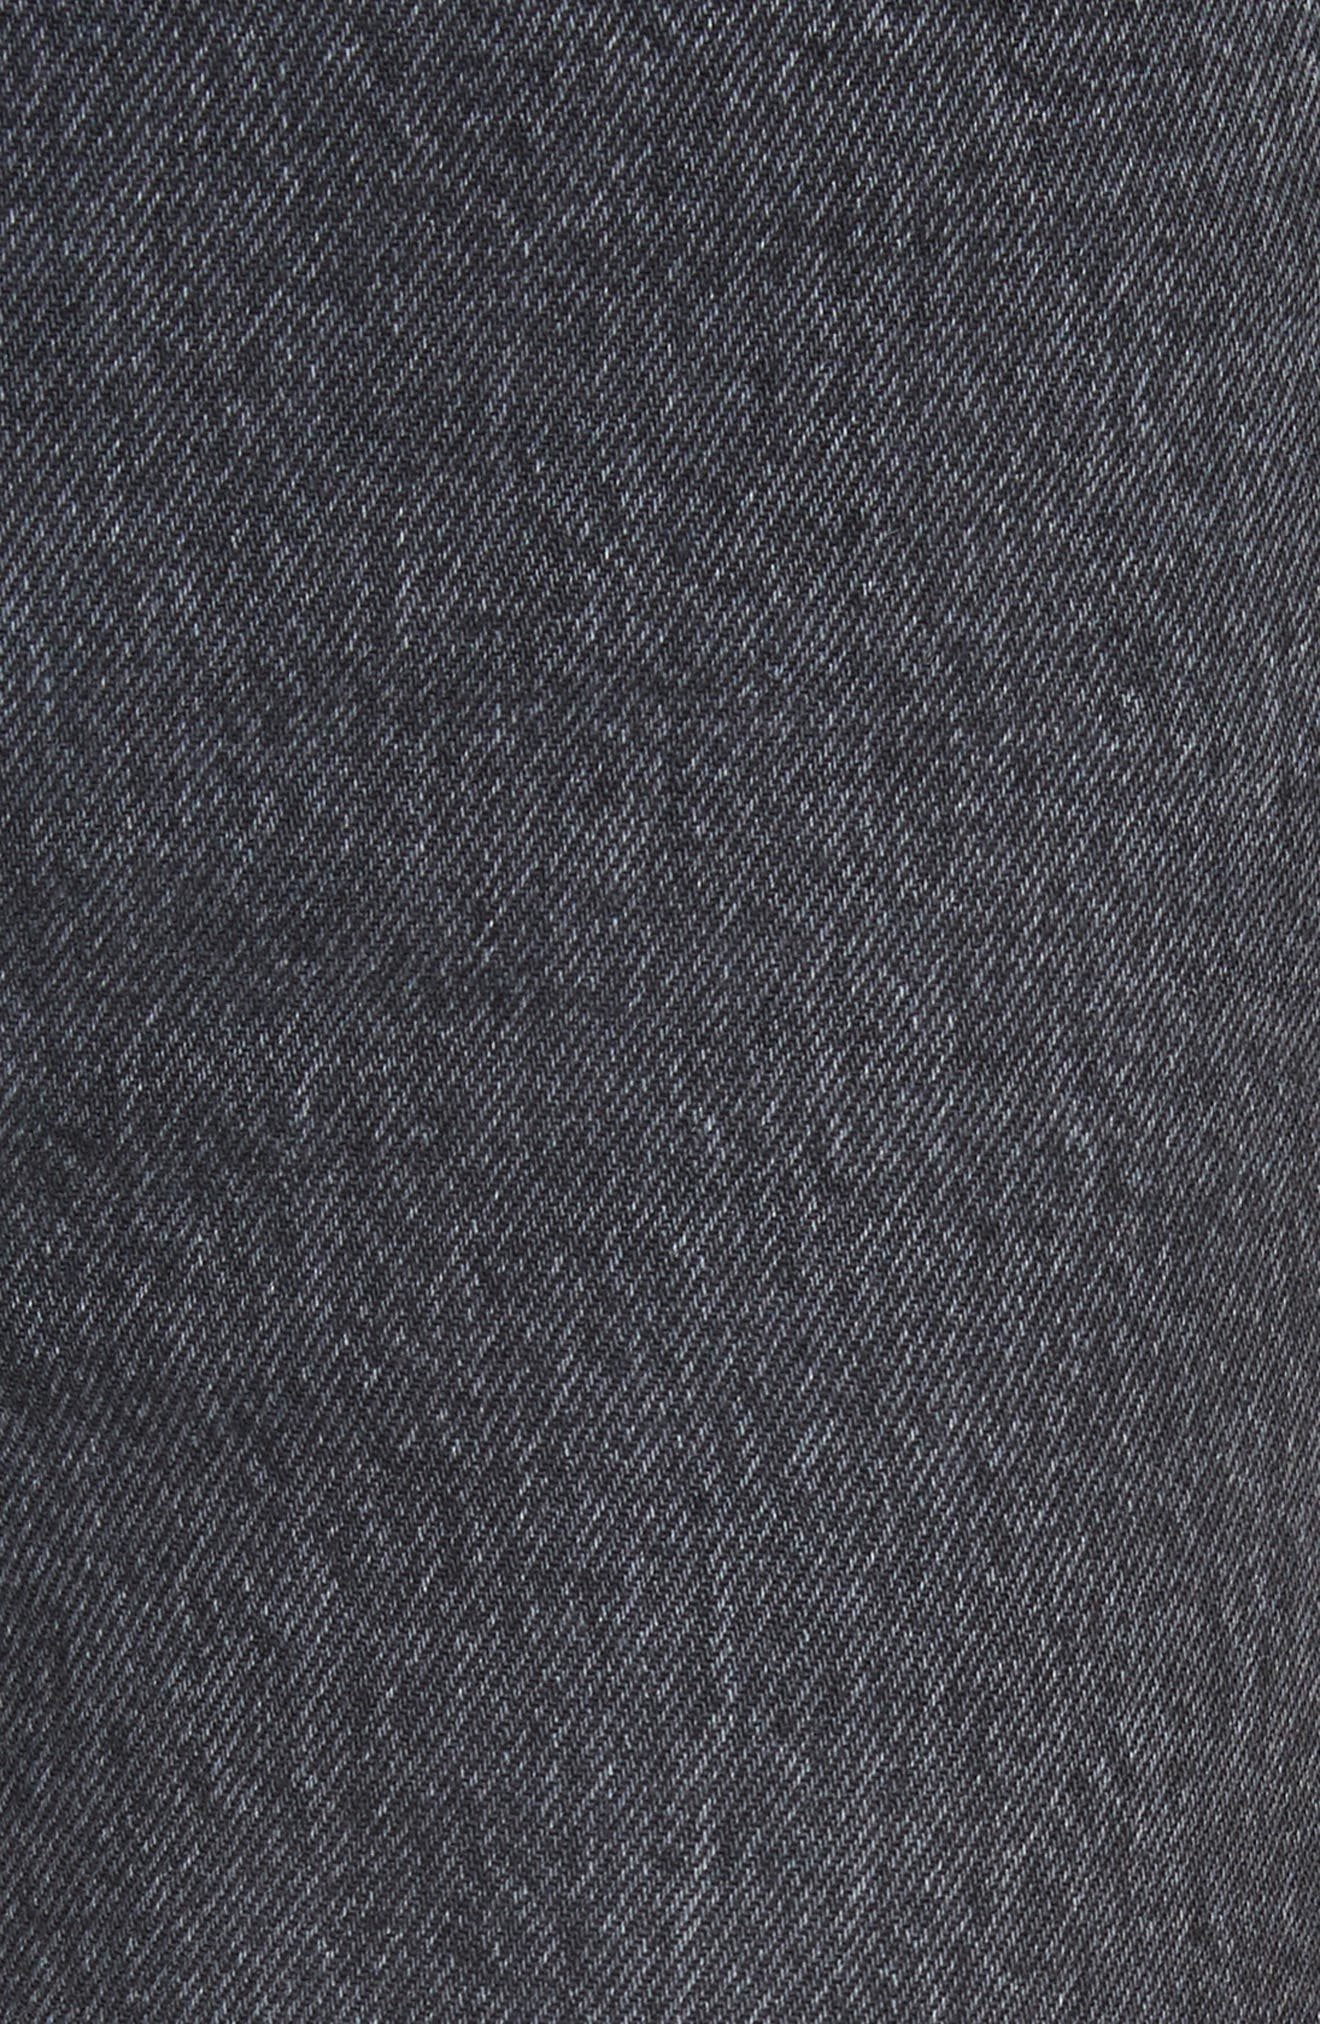 Dylan High Waist Crop Kick Flare Jeans,                             Alternate thumbnail 5, color,                             Grey Kuro